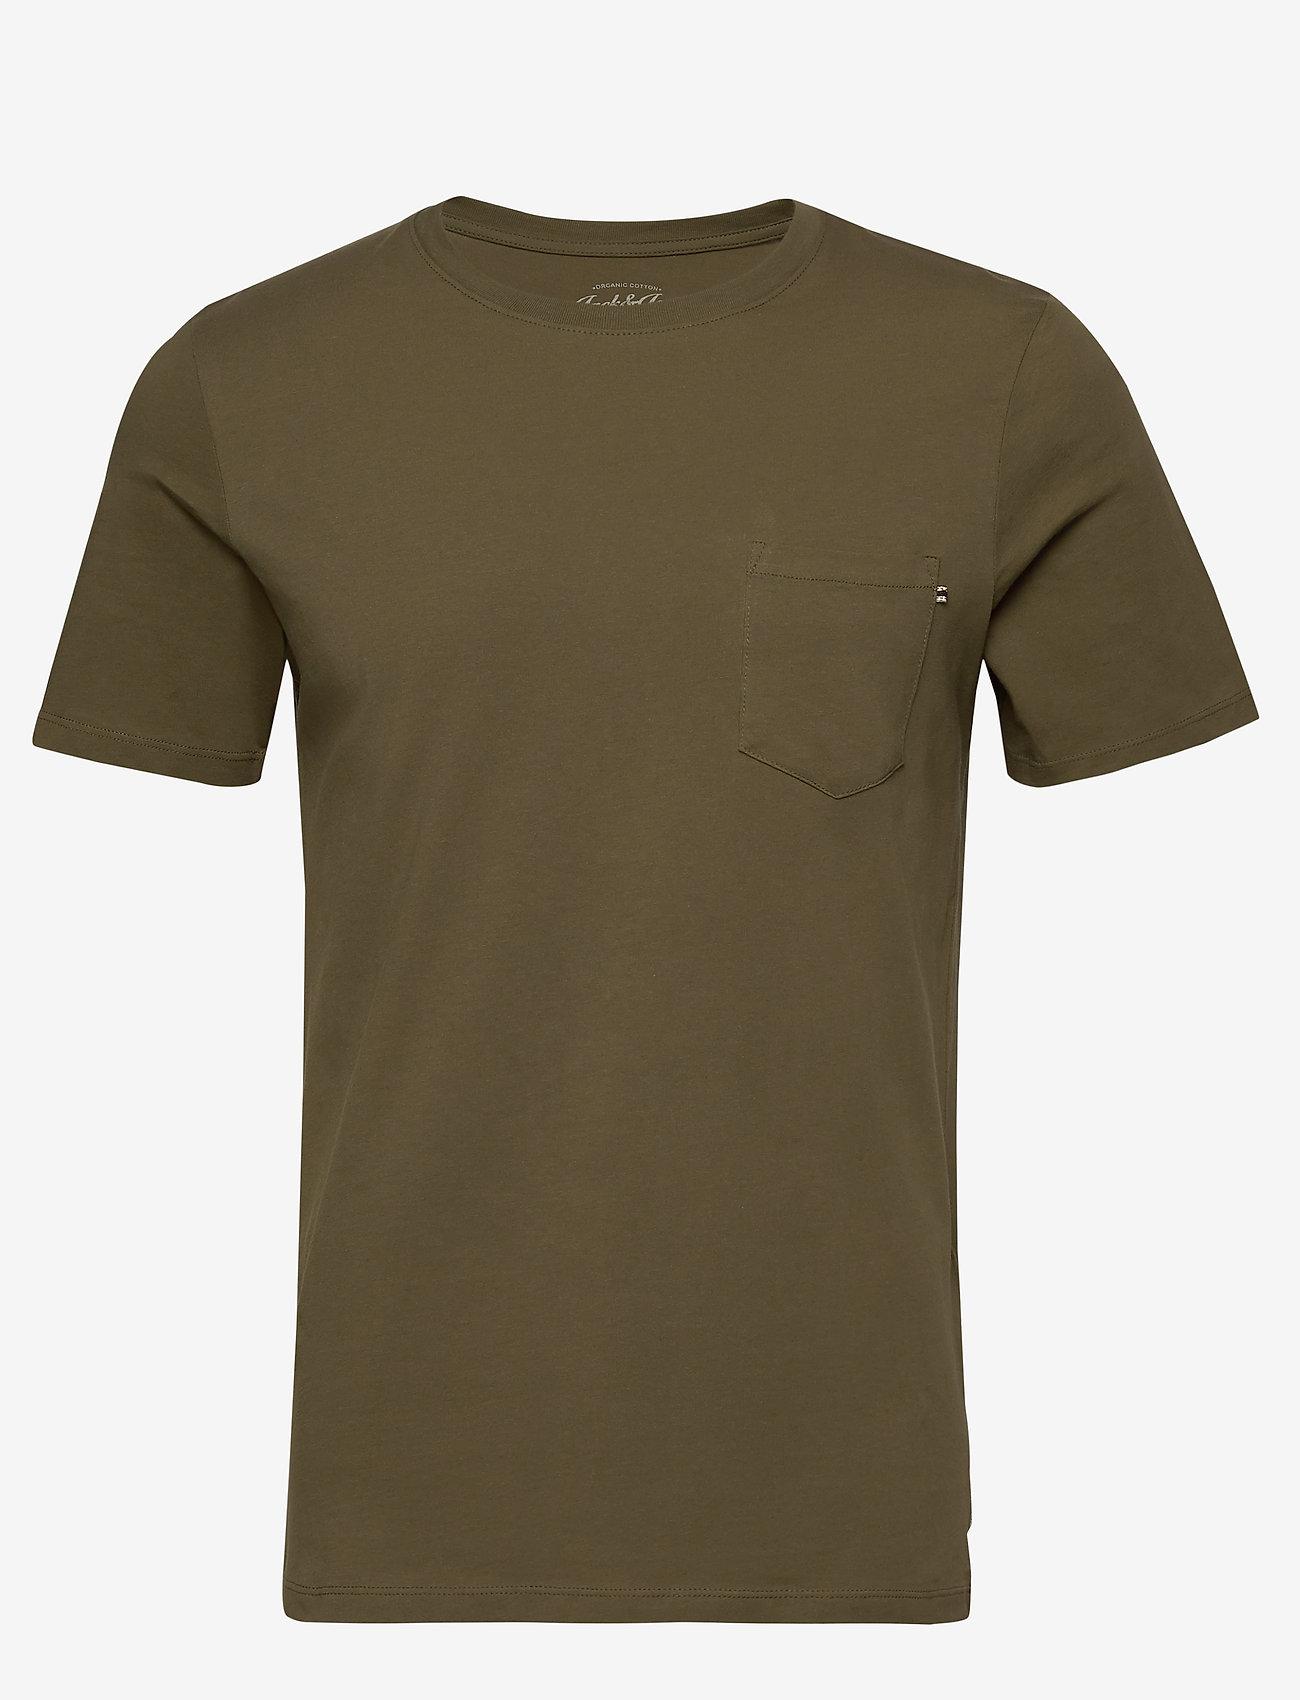 Jack & Jones - JJEPOCKET TEE SS O-NECK NOOS - basic t-shirts - olive night - 0